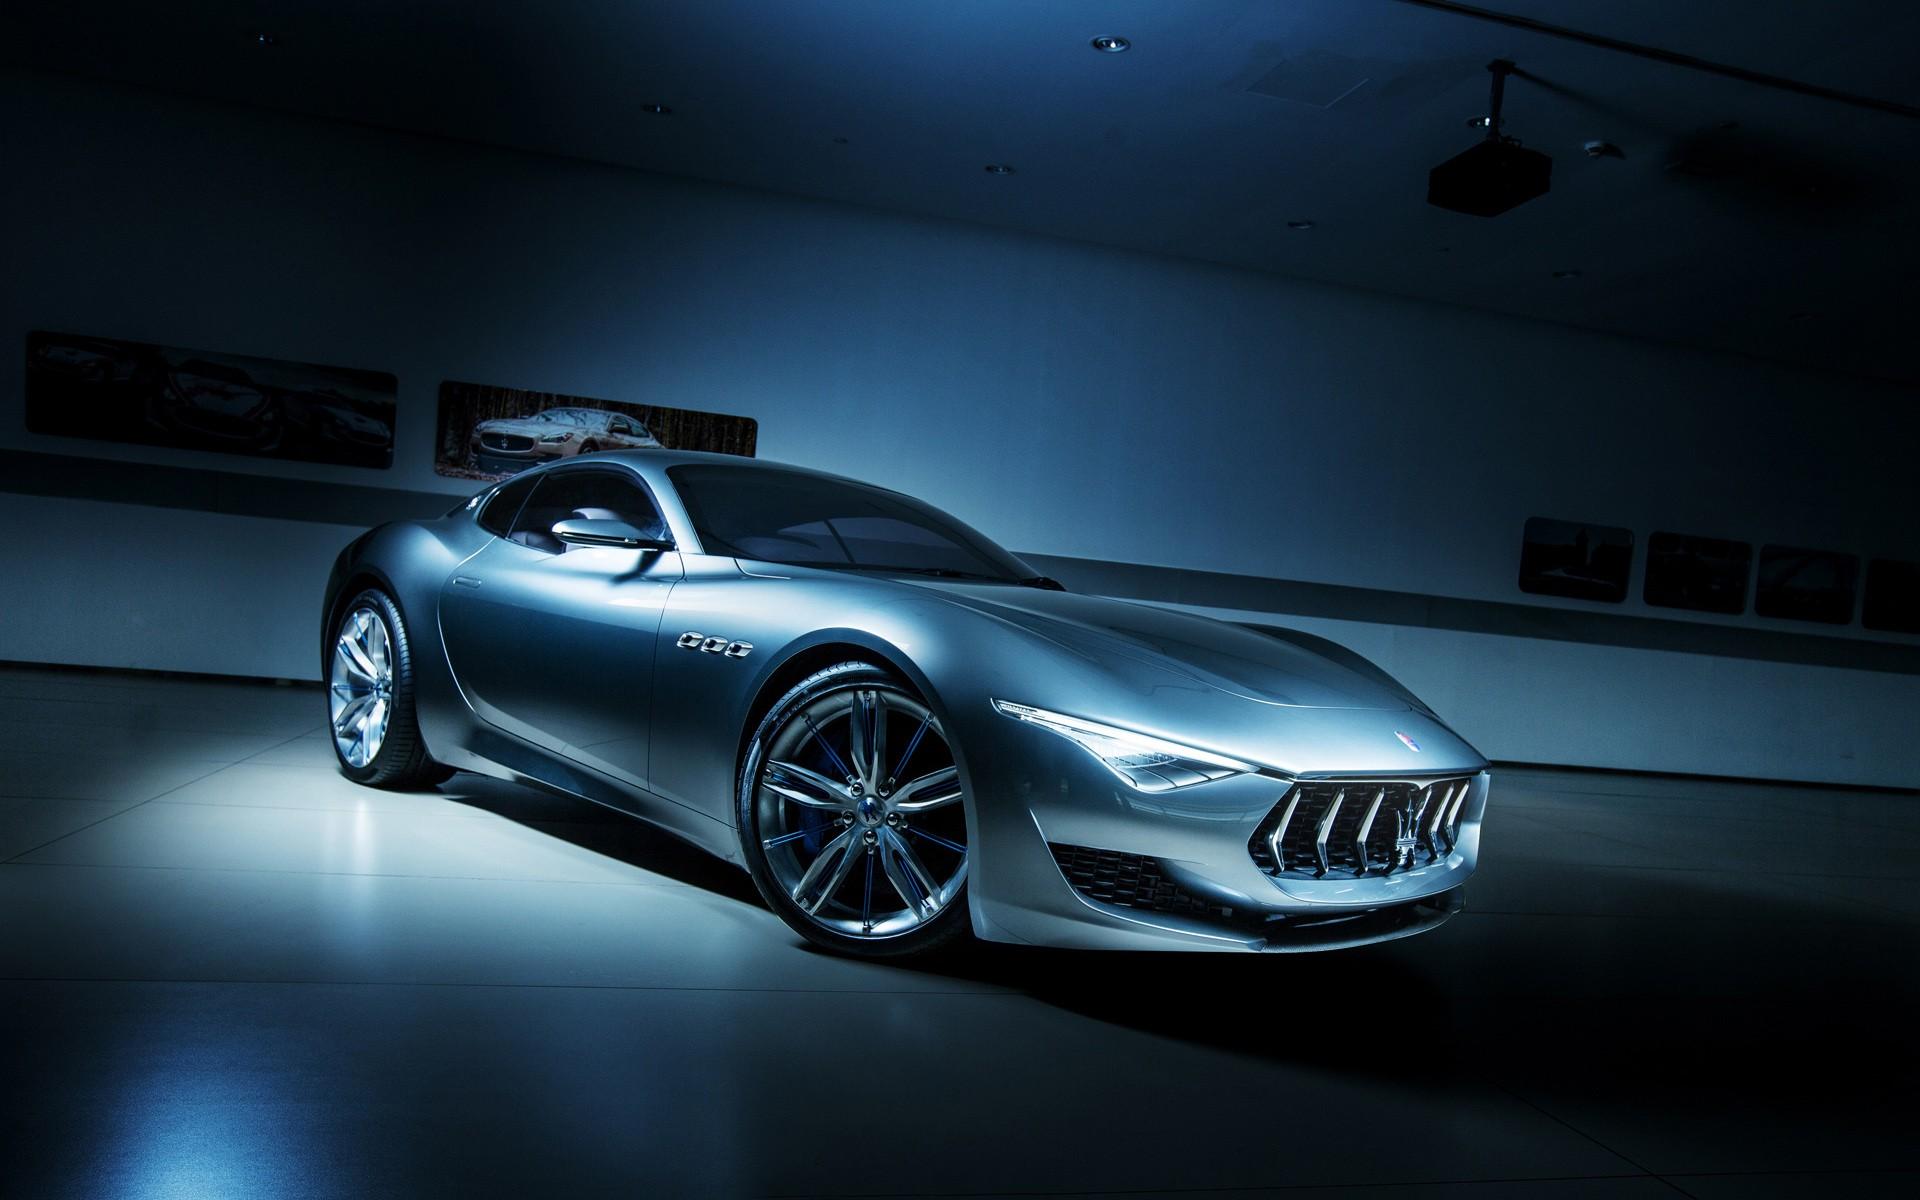 2017 Maserati Alfieri Hd Cars 4k Wallpapers Images